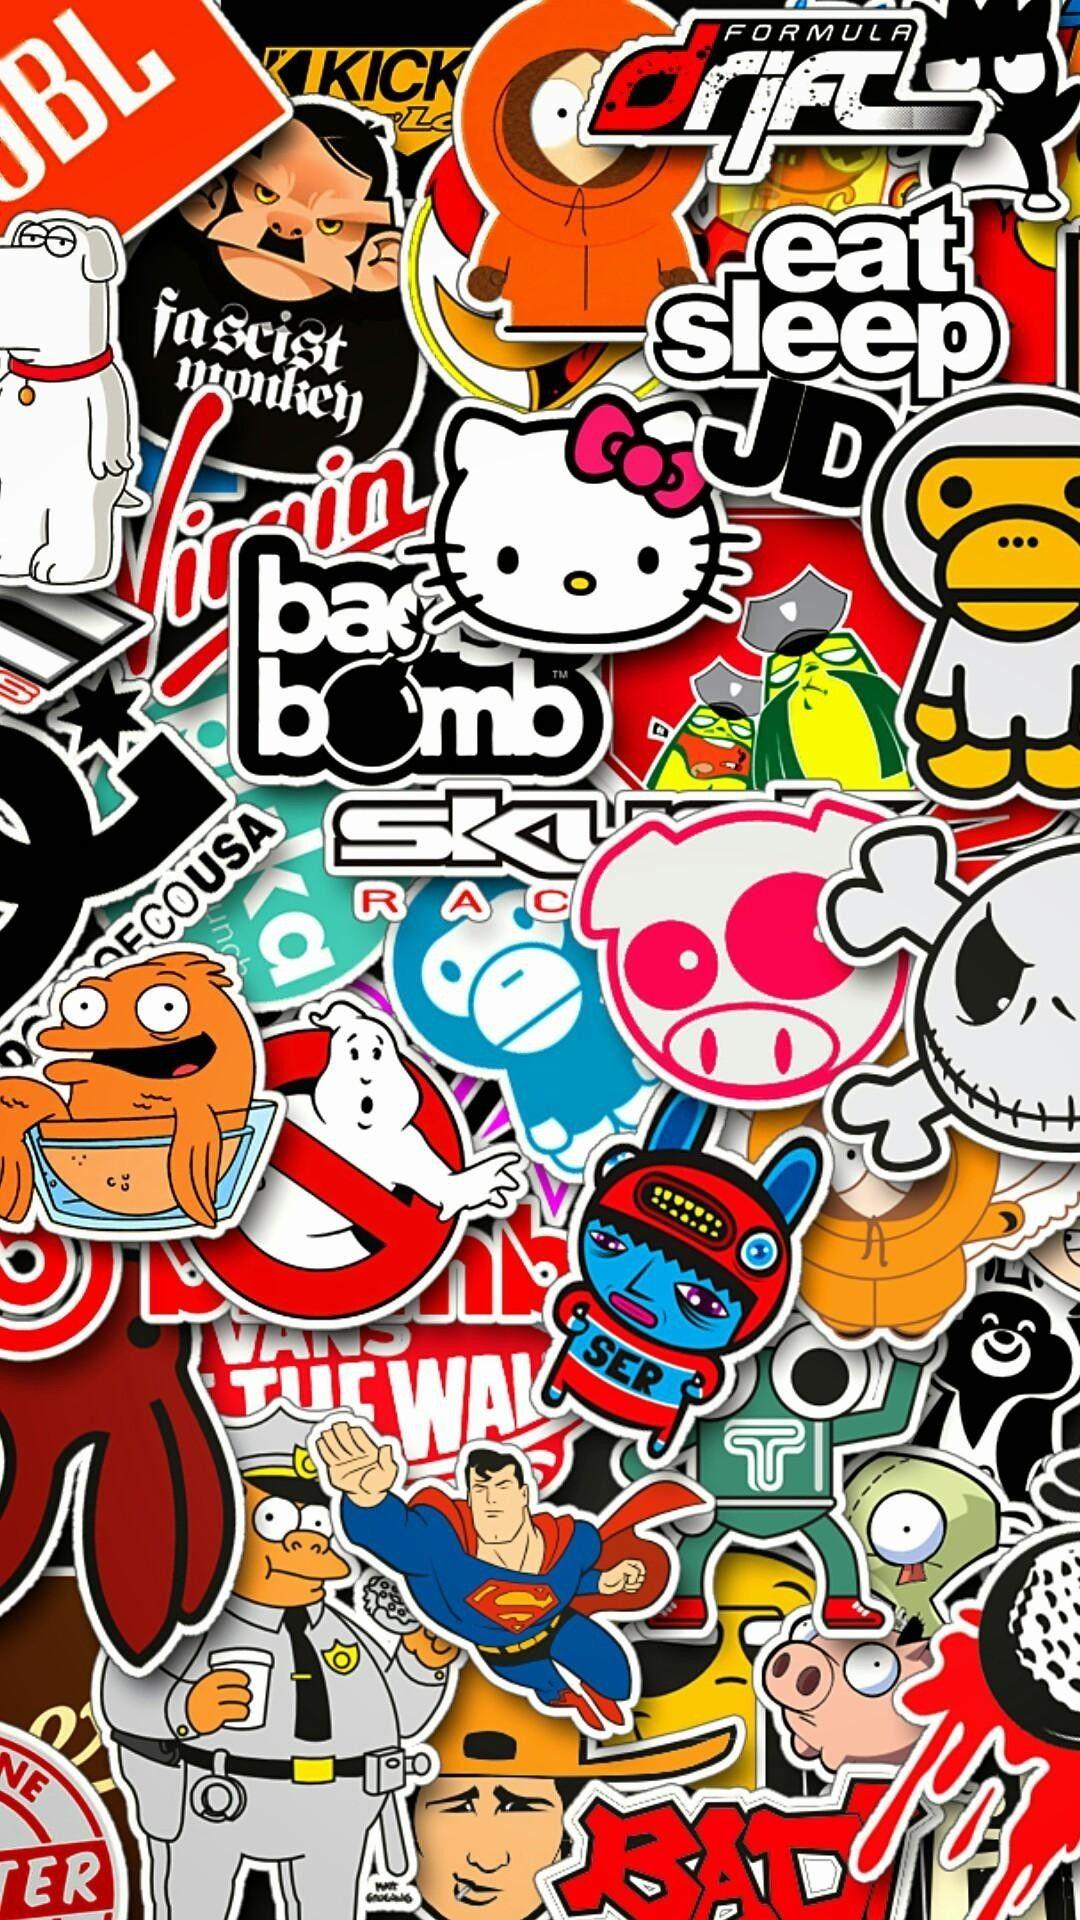 Sticker Bomb Jdm Wallpaper - Top Wallpapers